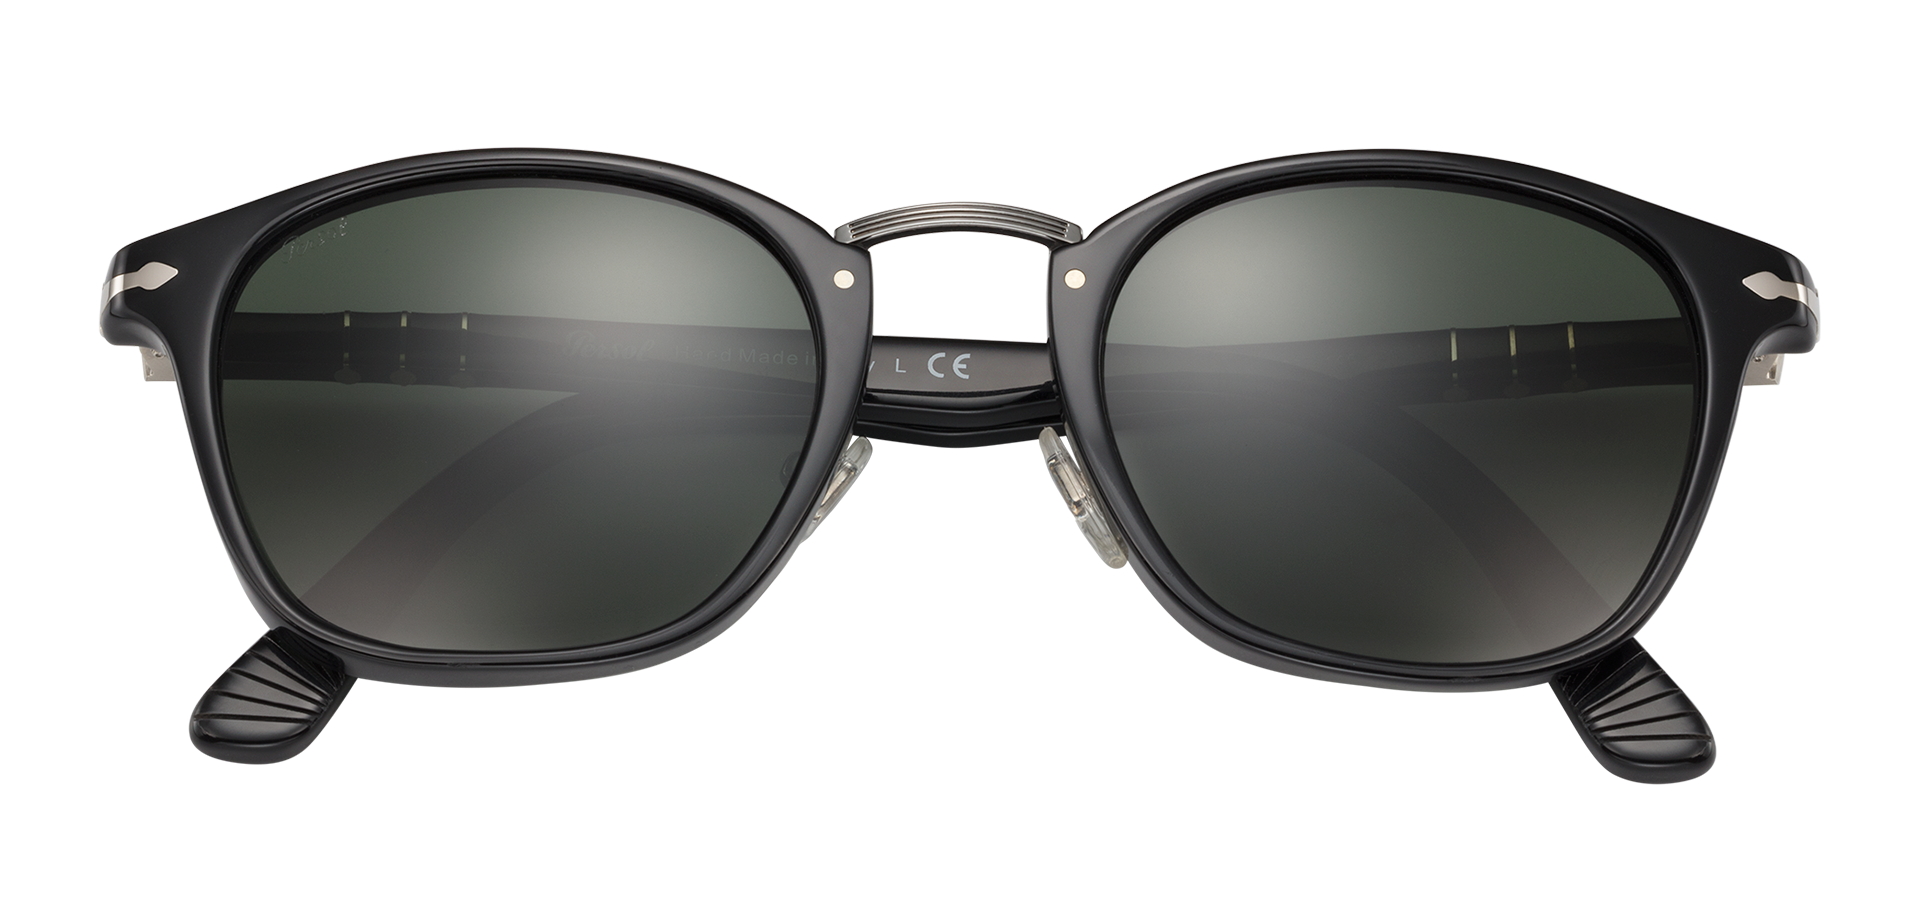 255ab6ddce Persol sunglasses